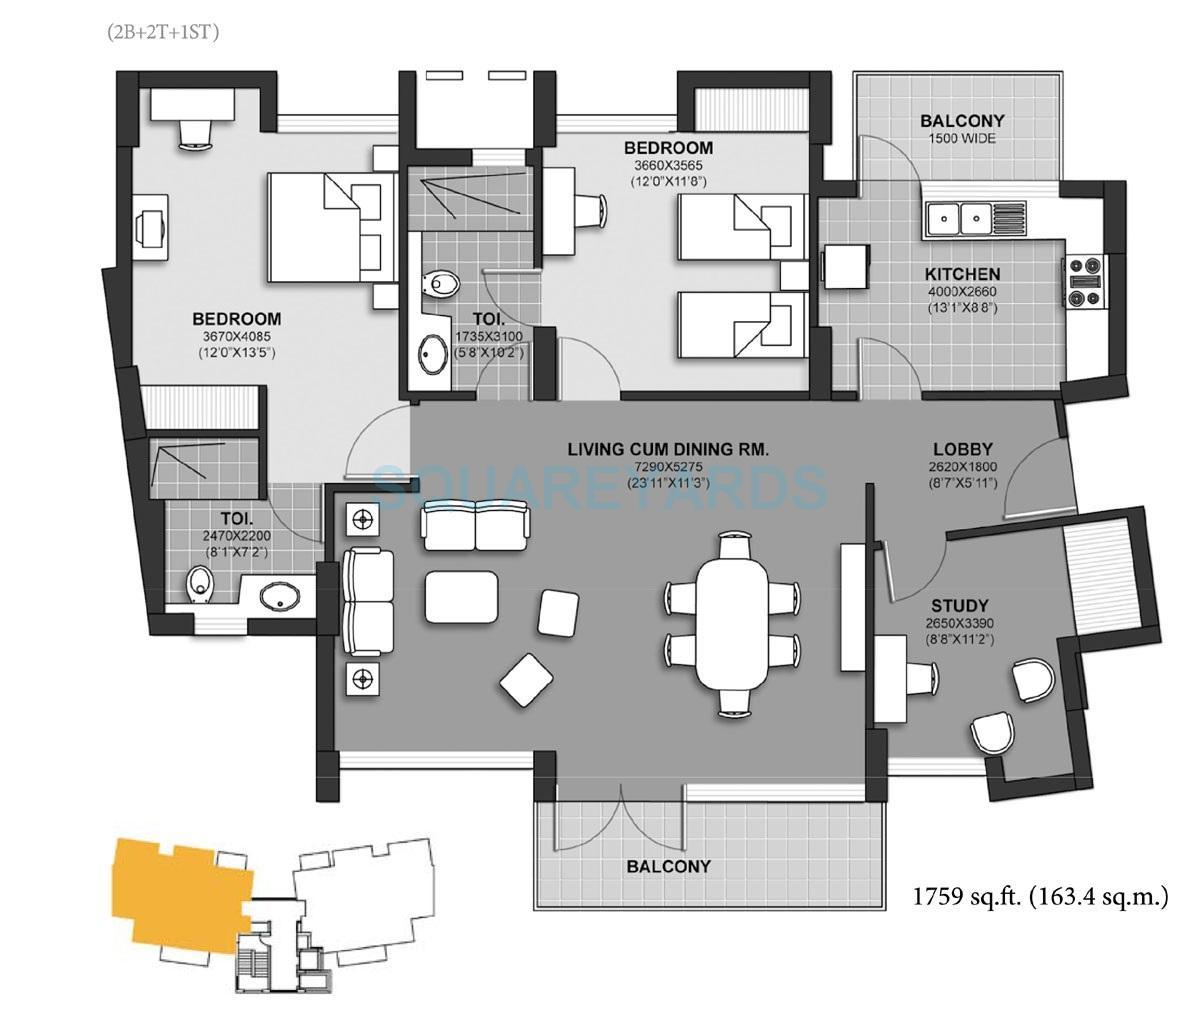 unitech harmony apartment 2b 2t 1st 1759sqft 1